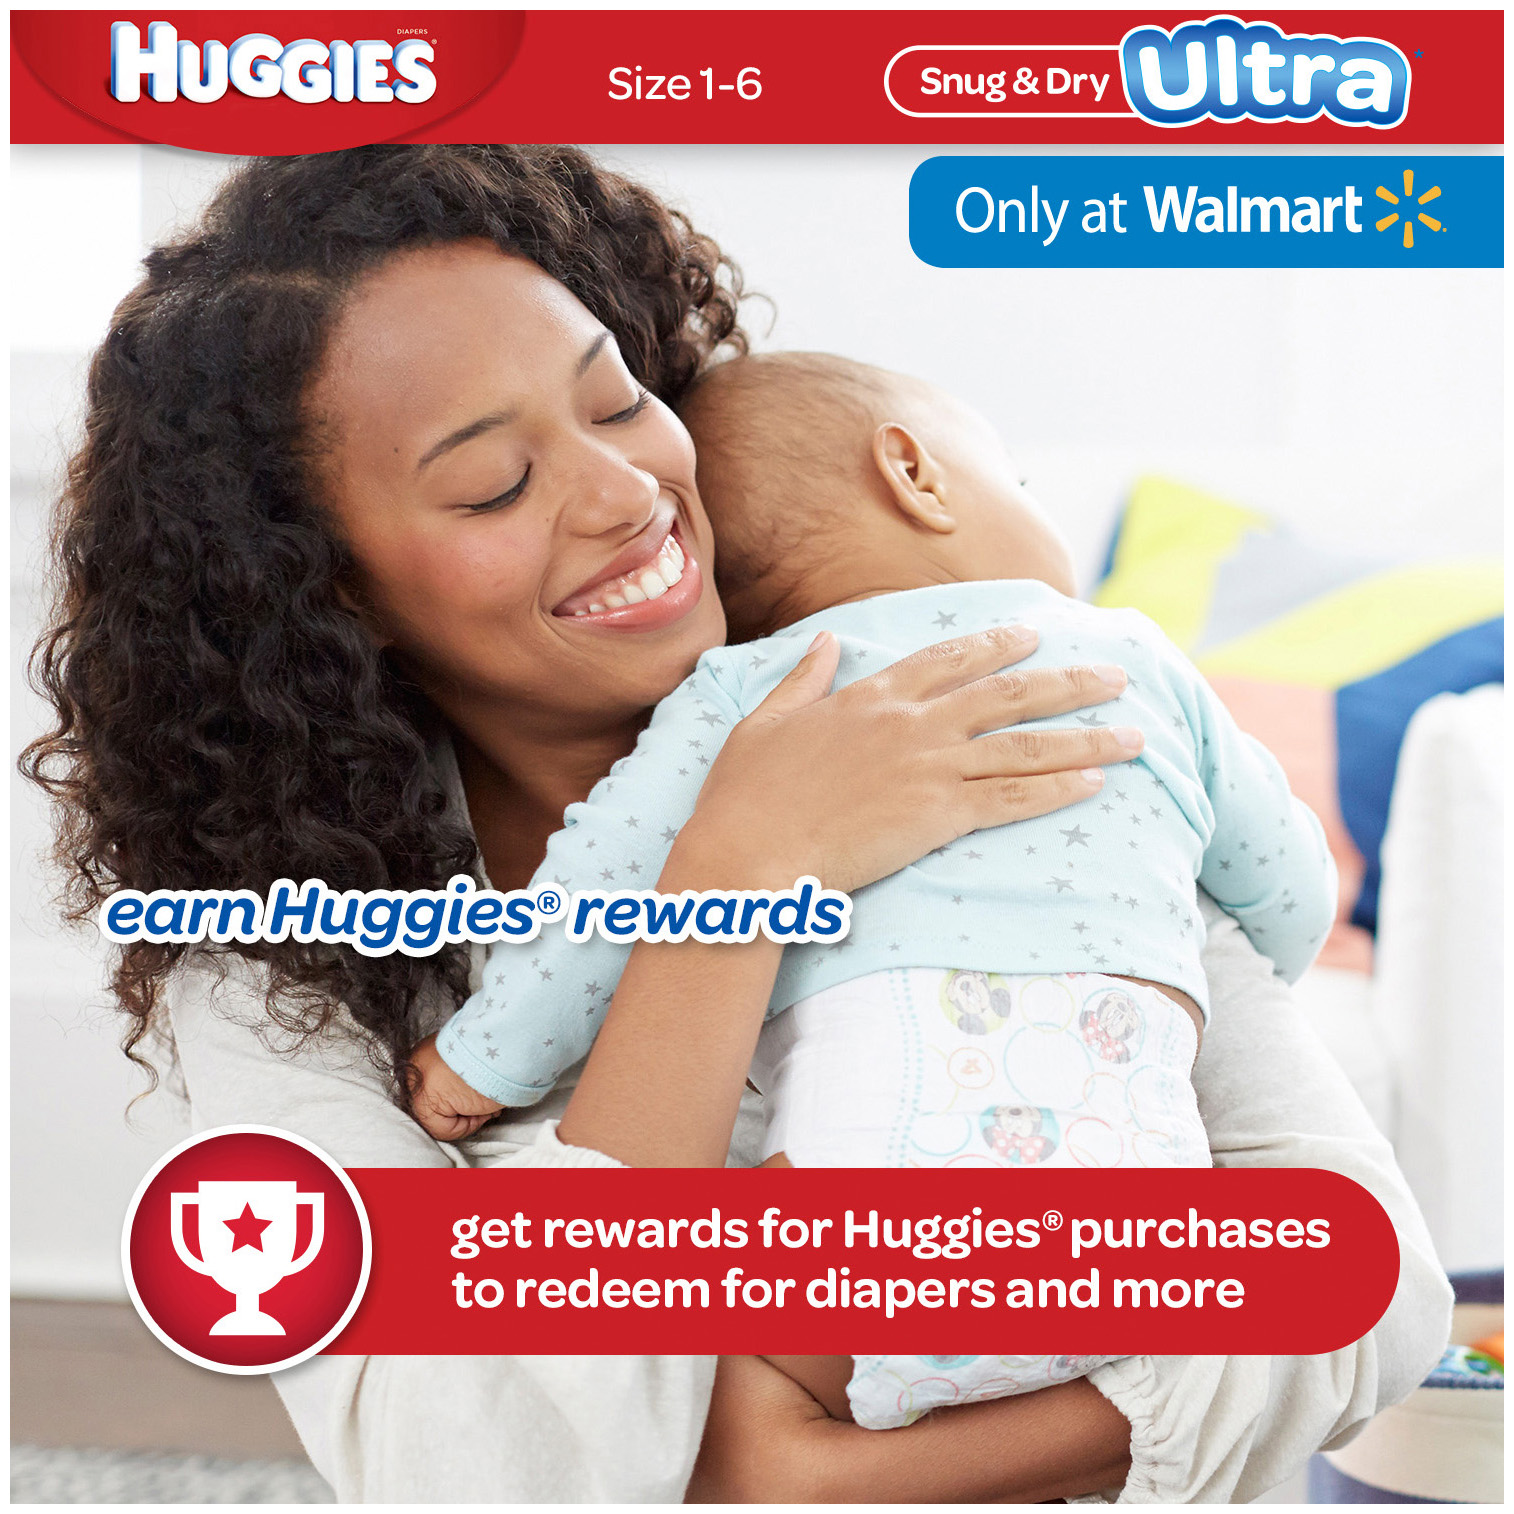 HUGGIES Snug & Dry Ultra Diapers, Size 1, 148 Diapers - Walmart.com